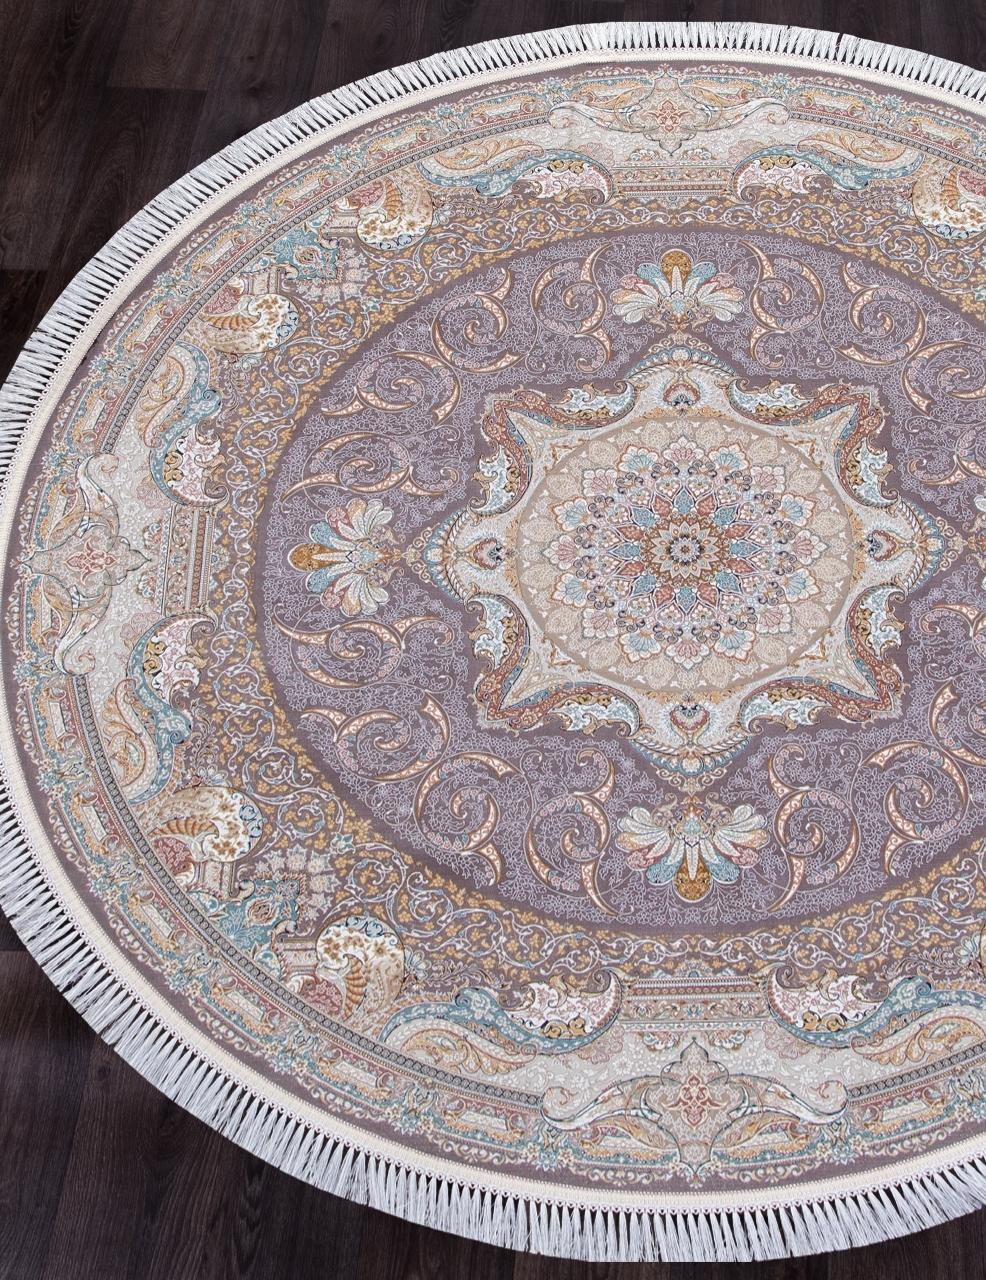 Ковер 144 - MELANGE PINK - Круг - коллекция FARSI 1500 - фото 1